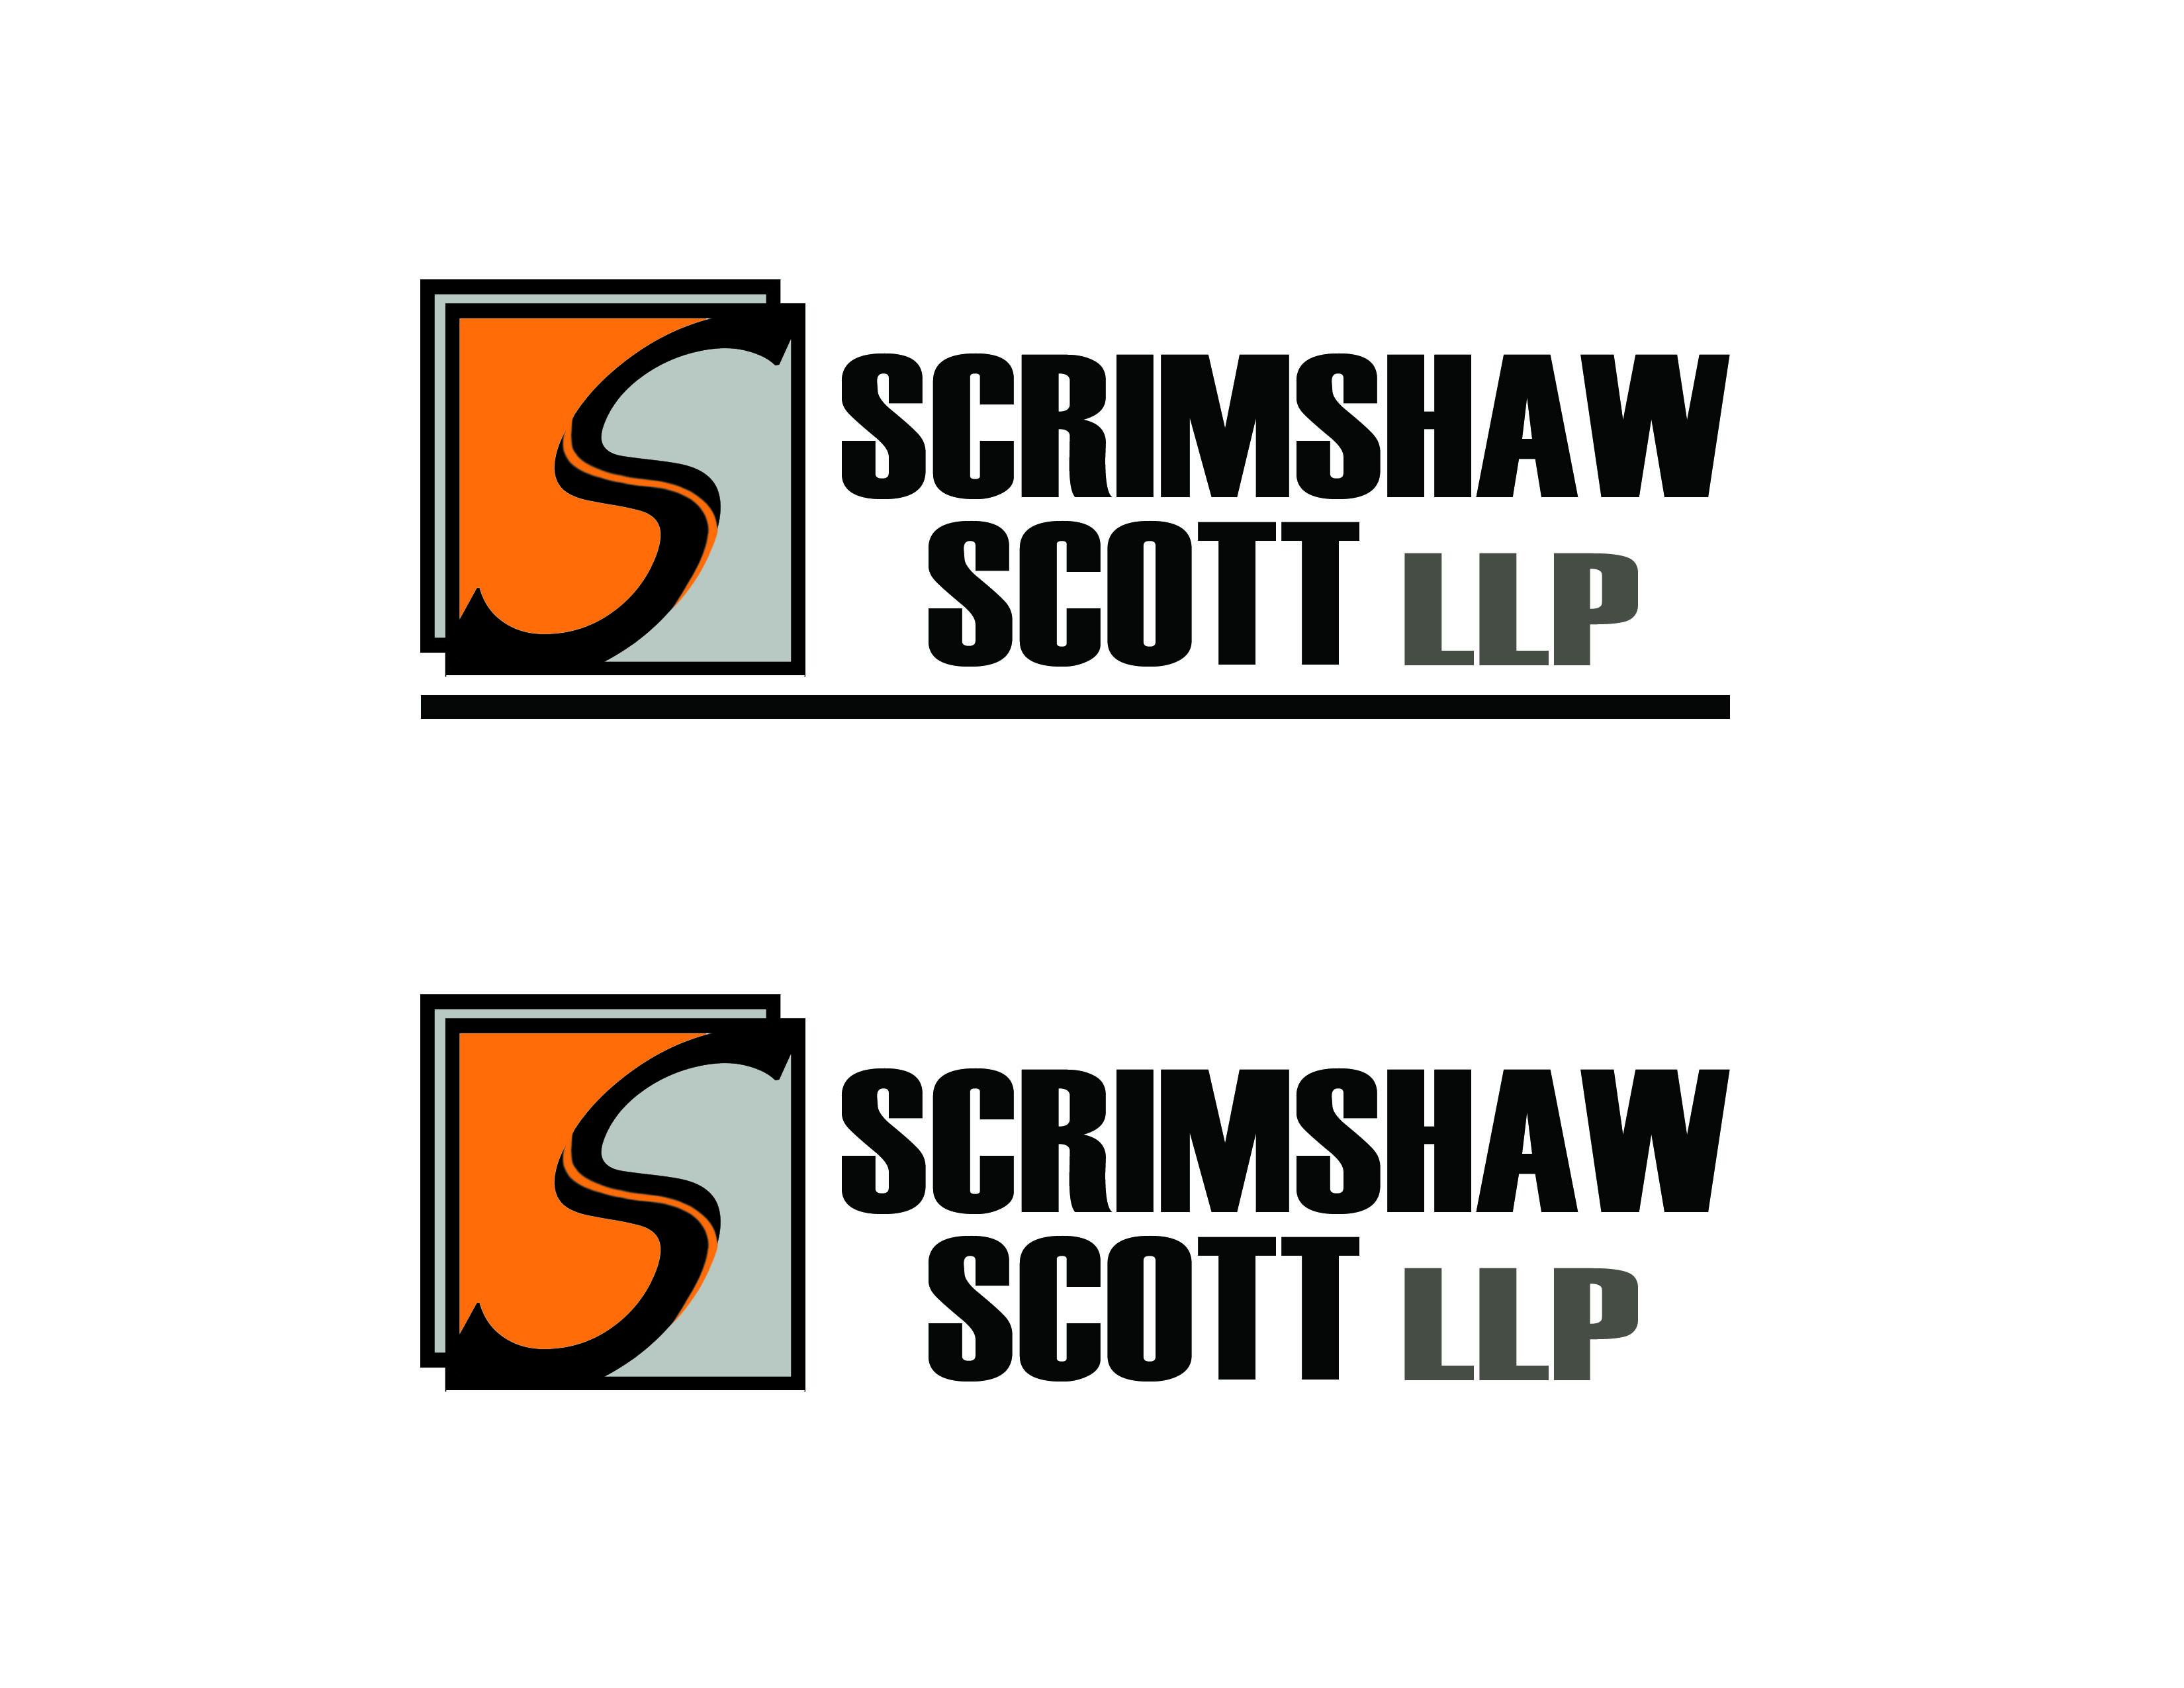 Logo Design by Alan Esclamado - Entry No. 12 in the Logo Design Contest Striking Logo Design for law firm SCRIMSHAW  SCOTT  LLP.